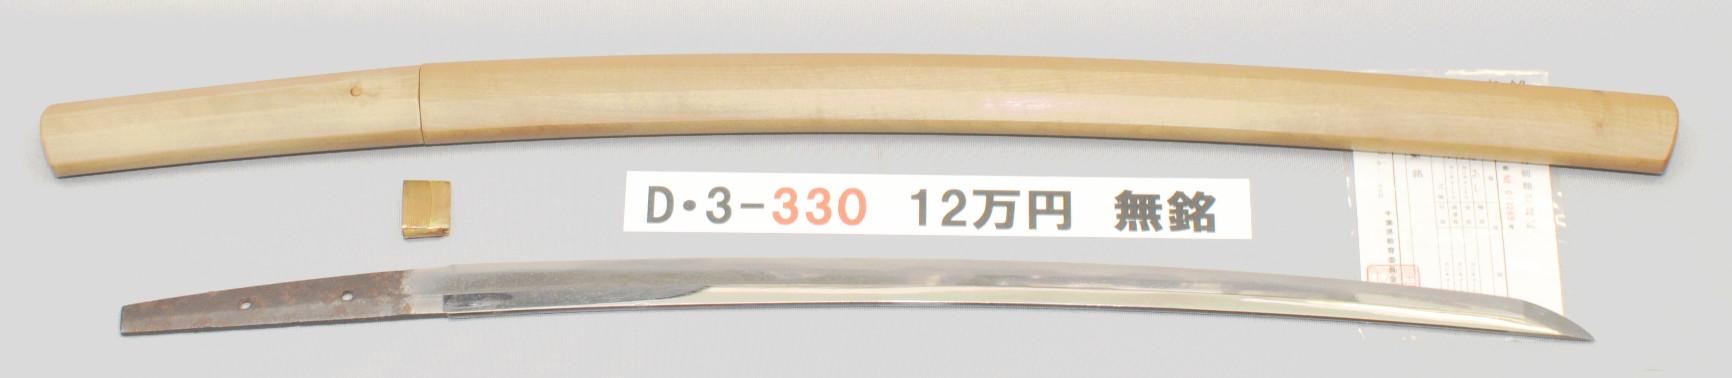 D3330